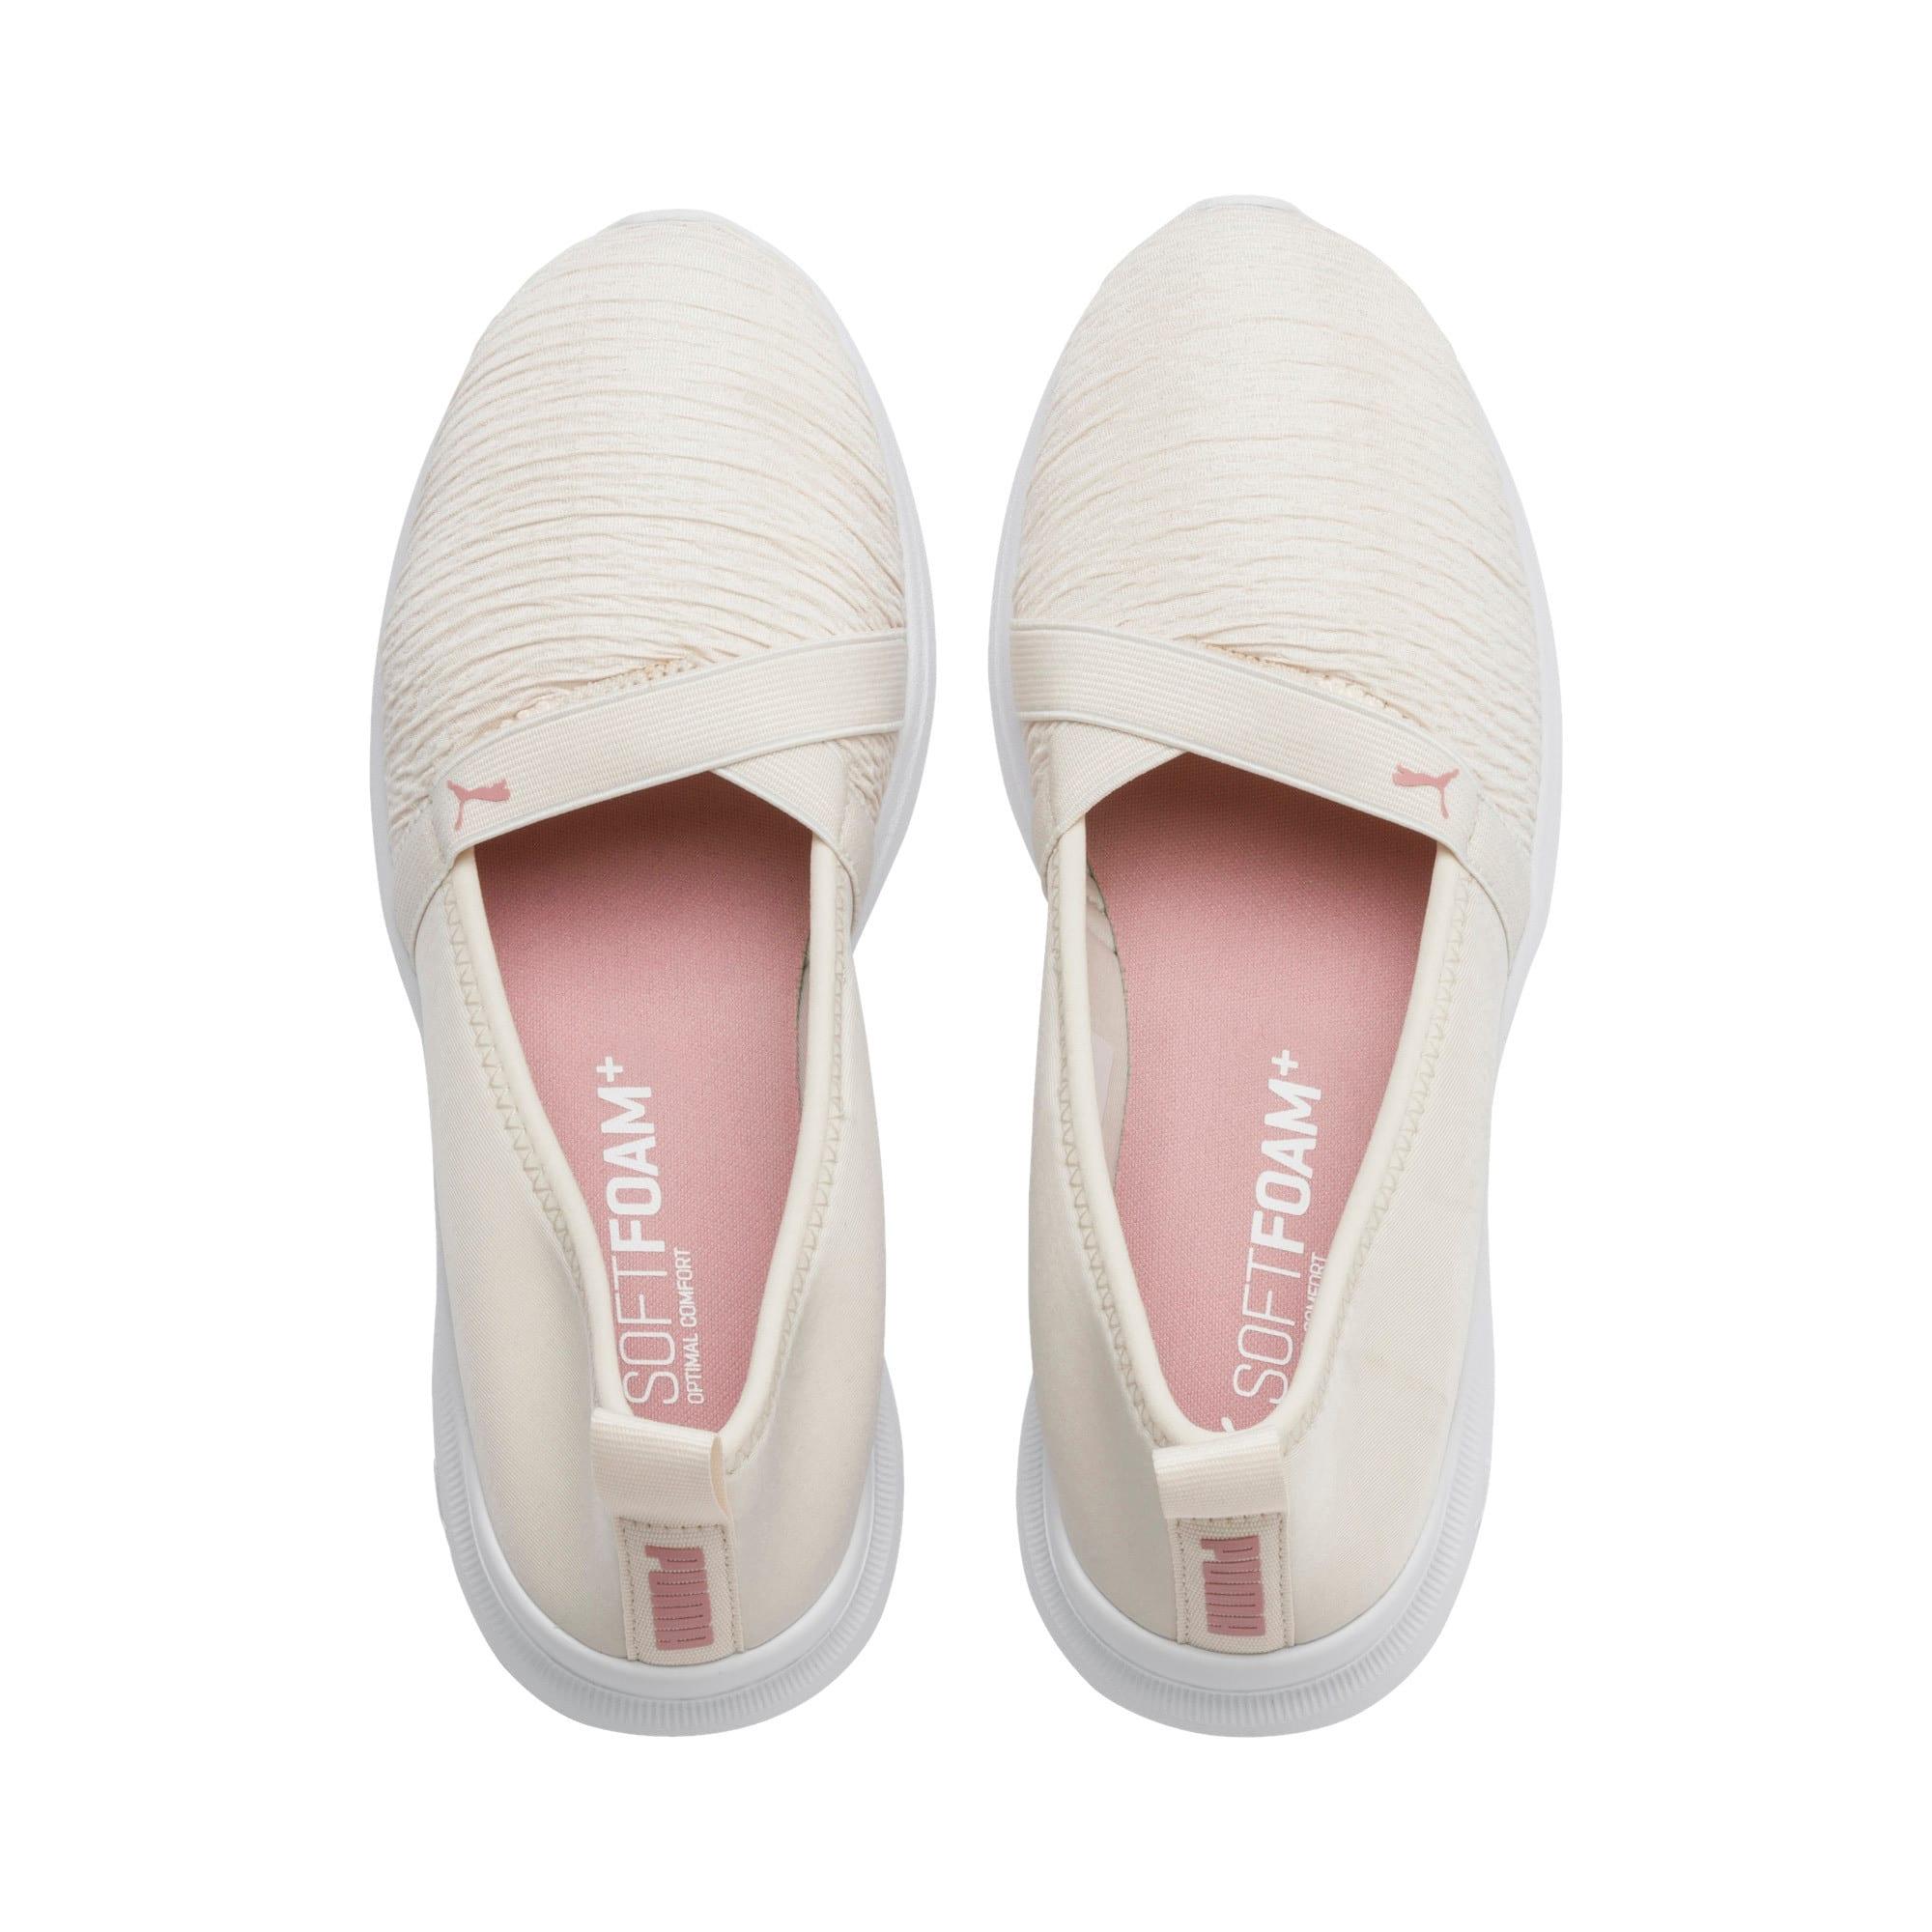 Thumbnail 7 of Adelina Women's Ballet Shoes, Pastel Parchment-B Rose-Wht, medium